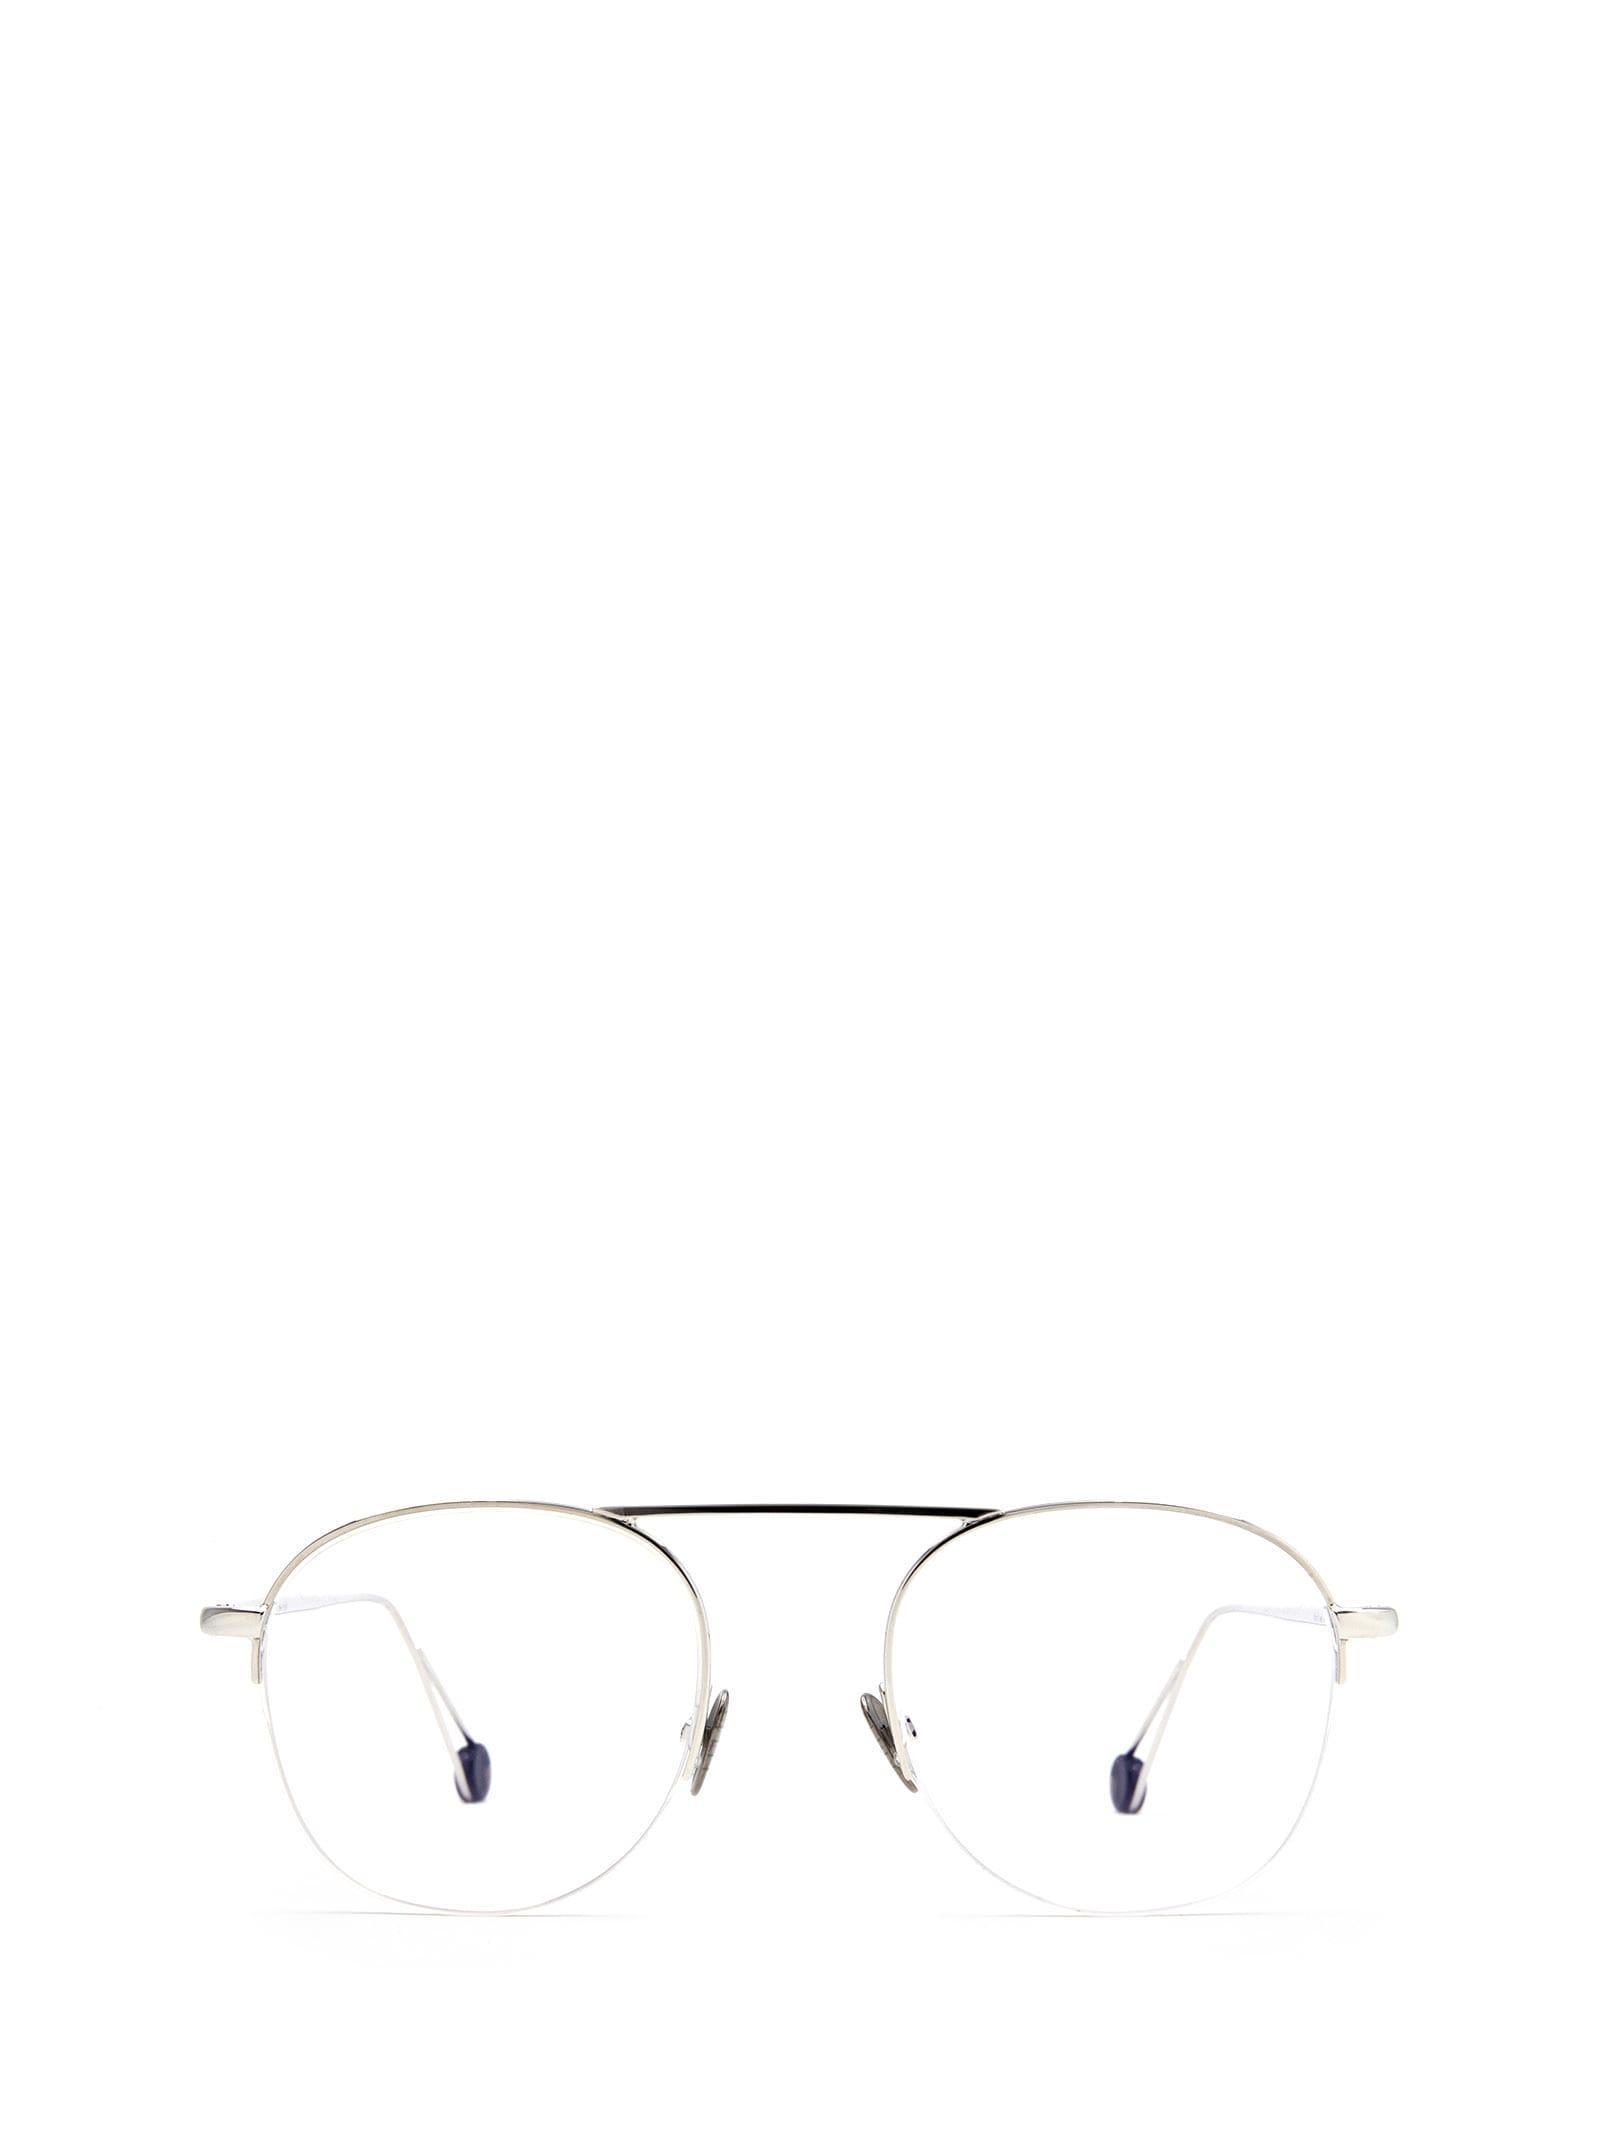 AHLEM Ahlem Voltaire White Gold Glasses